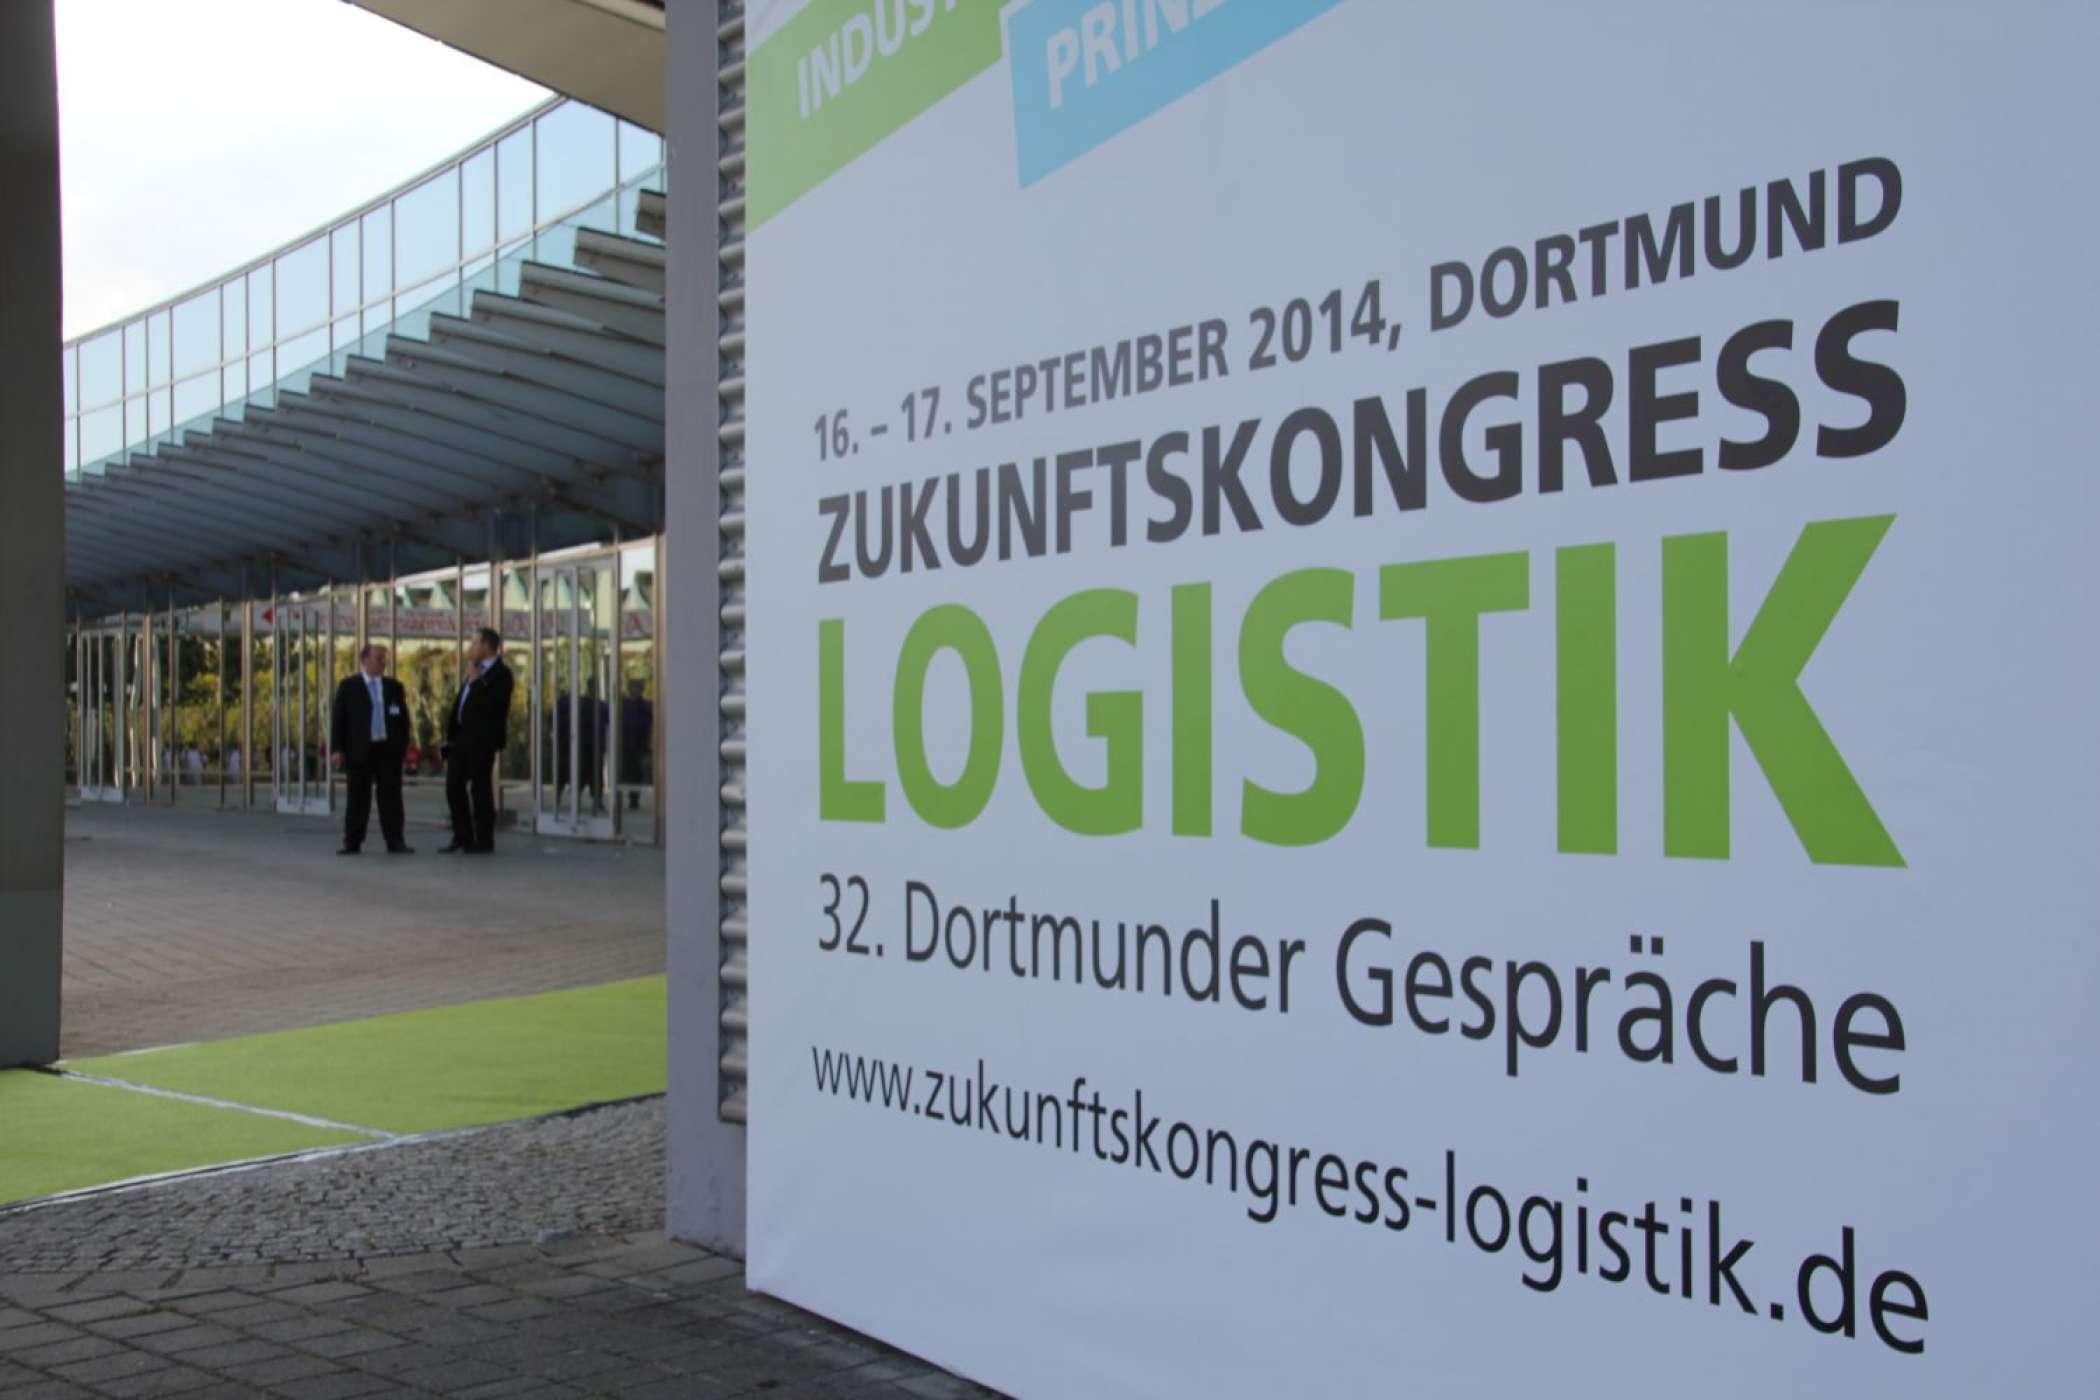 Zukunftskongress Logistik Bilder Aus Dortmund Iml Fraunhofer